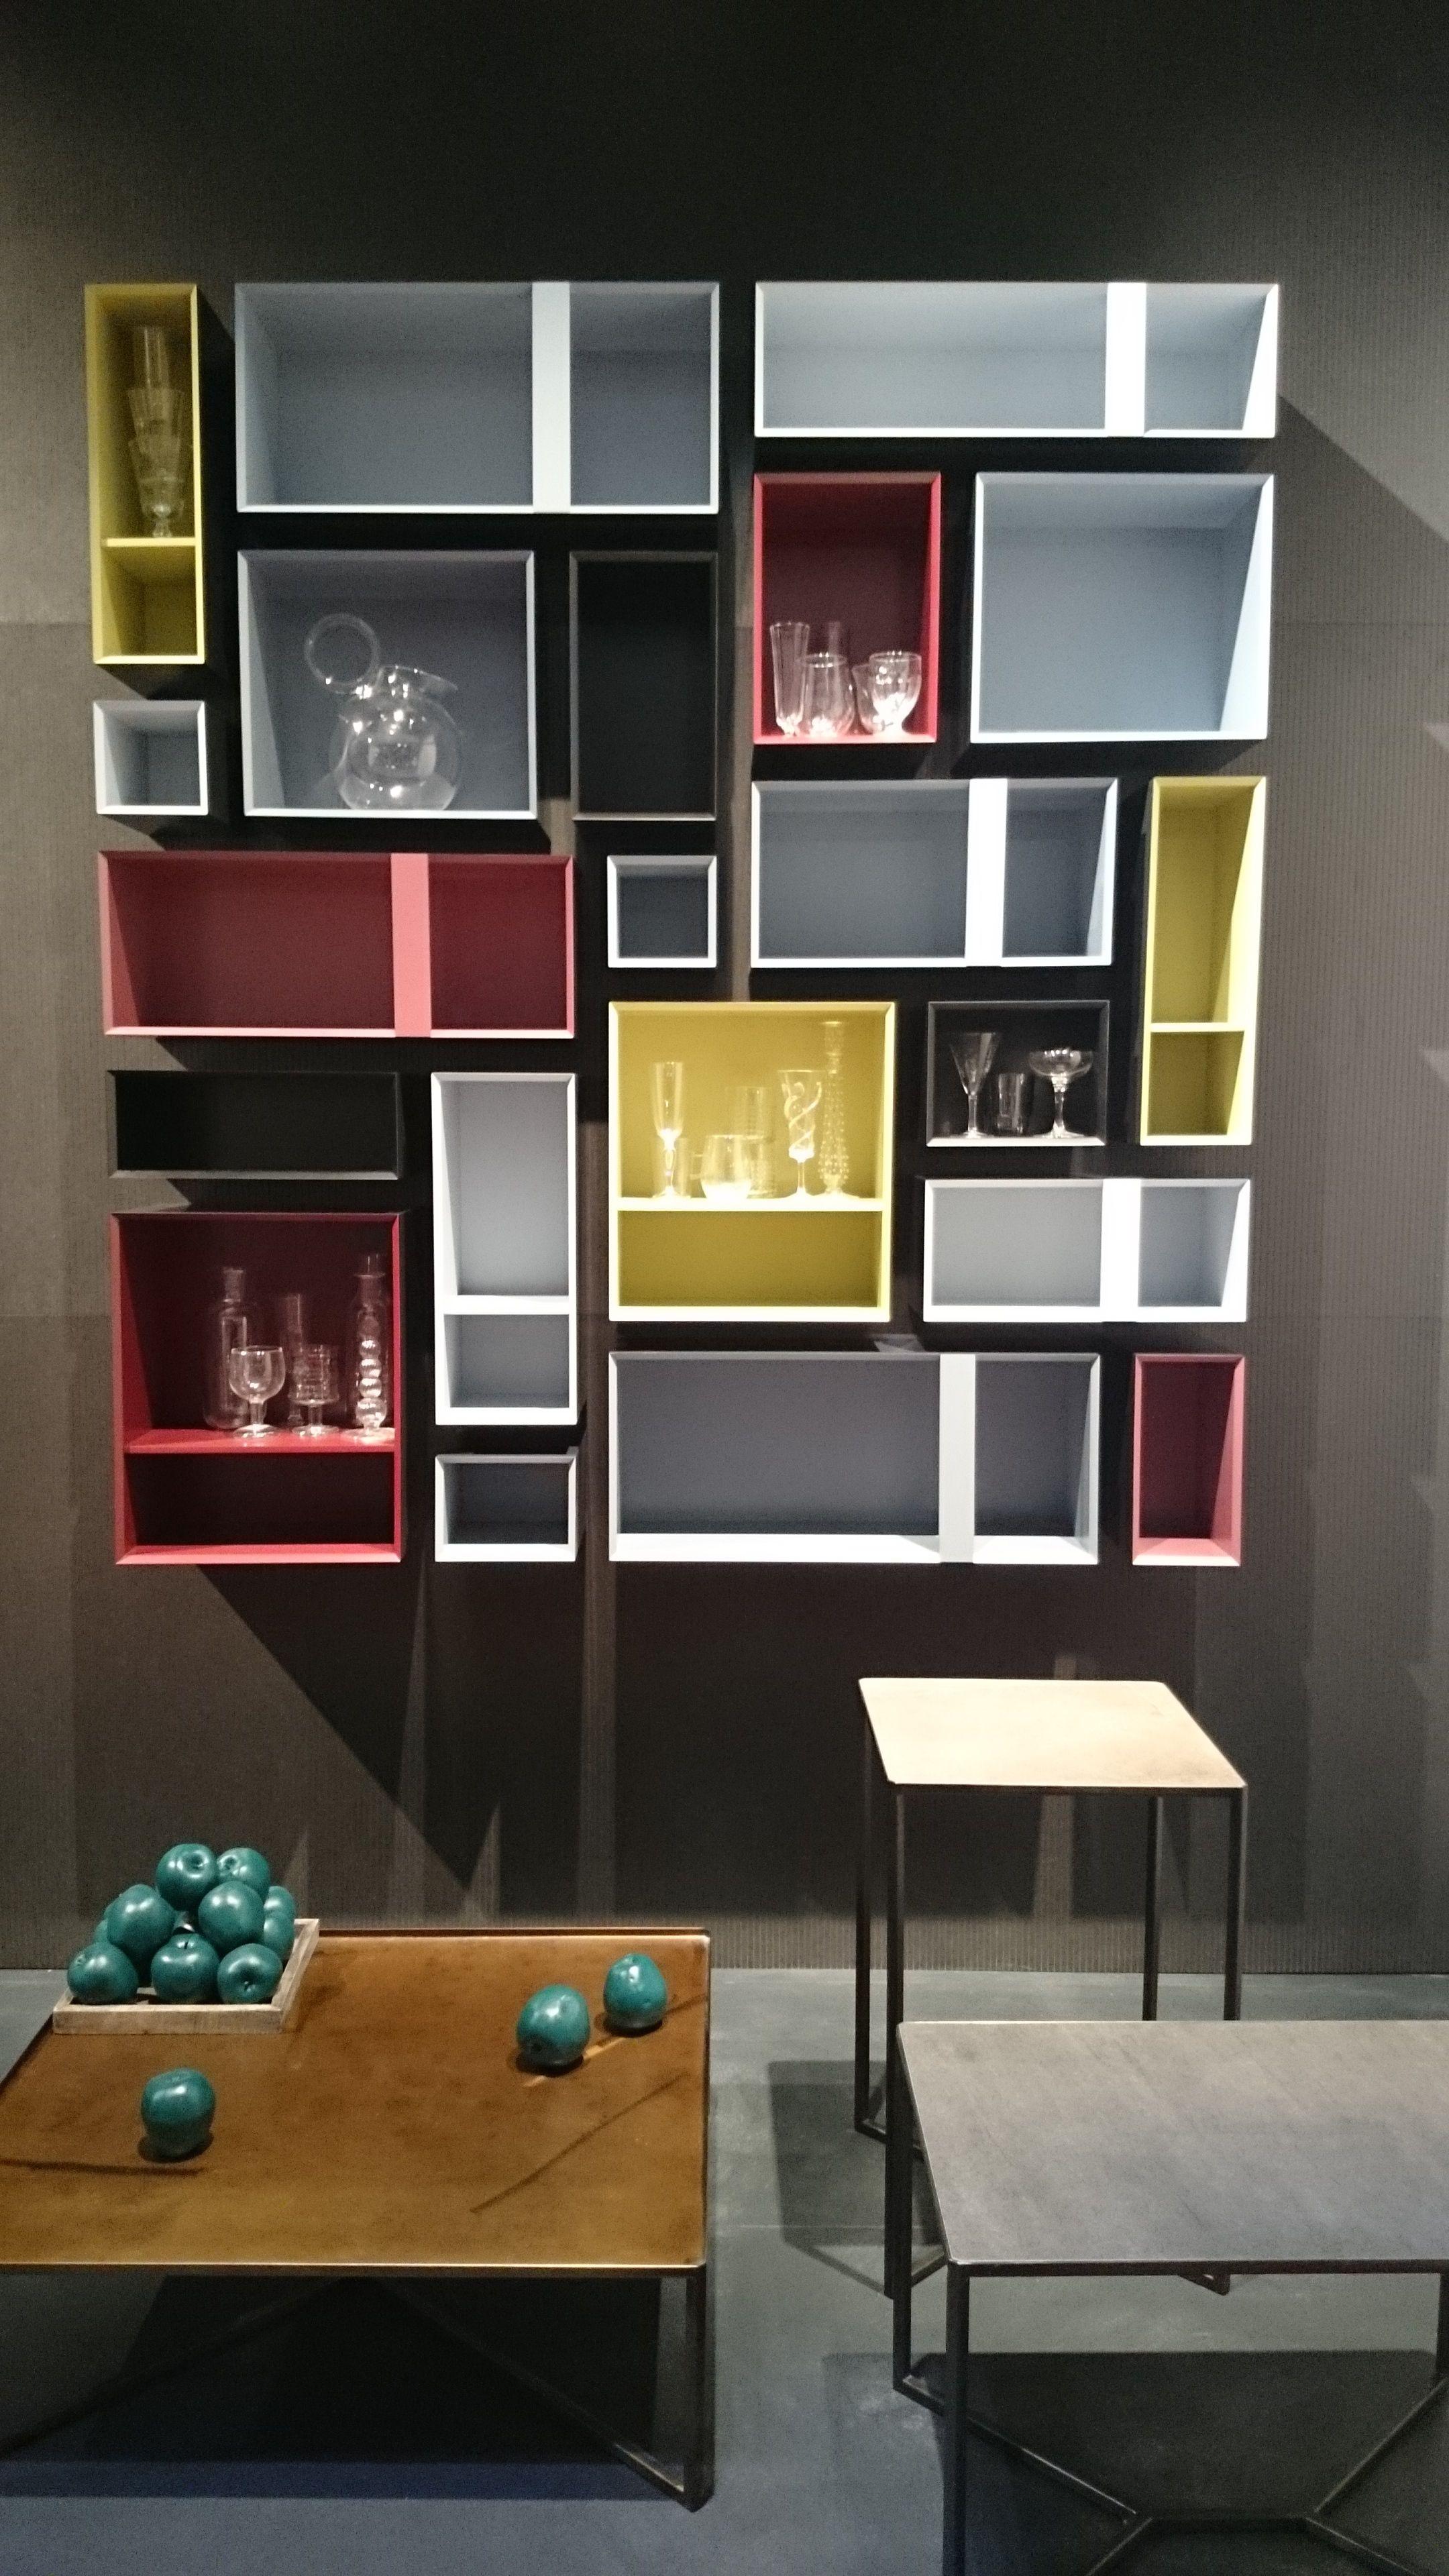 Design by Capodopera at Salone Del Mobile 2014 #milandesignweek ...